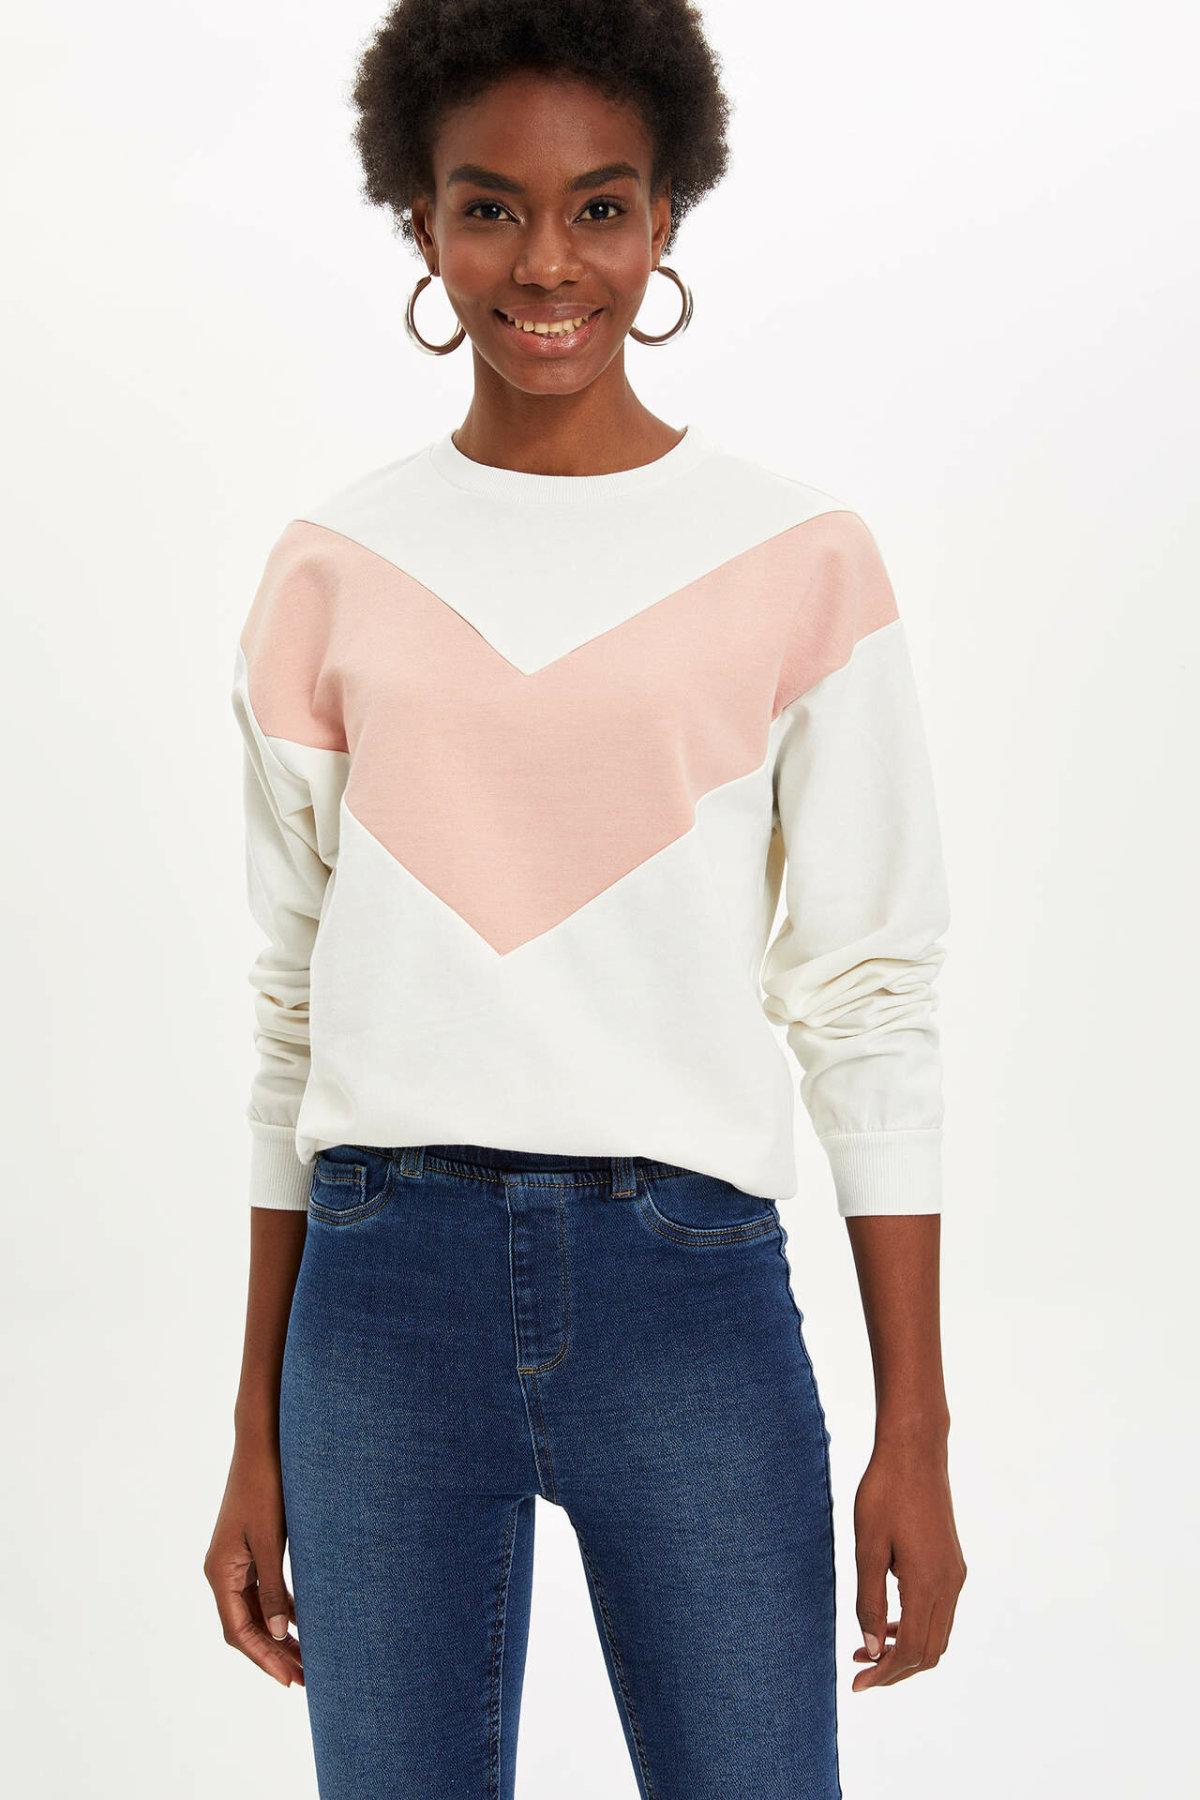 DeFacto Women Crewneck V-pattern Pullovers Ladies Fashion Casual Harajuku Loose Pullover Female Comfort Tops Autumn -M5400AZ19WN